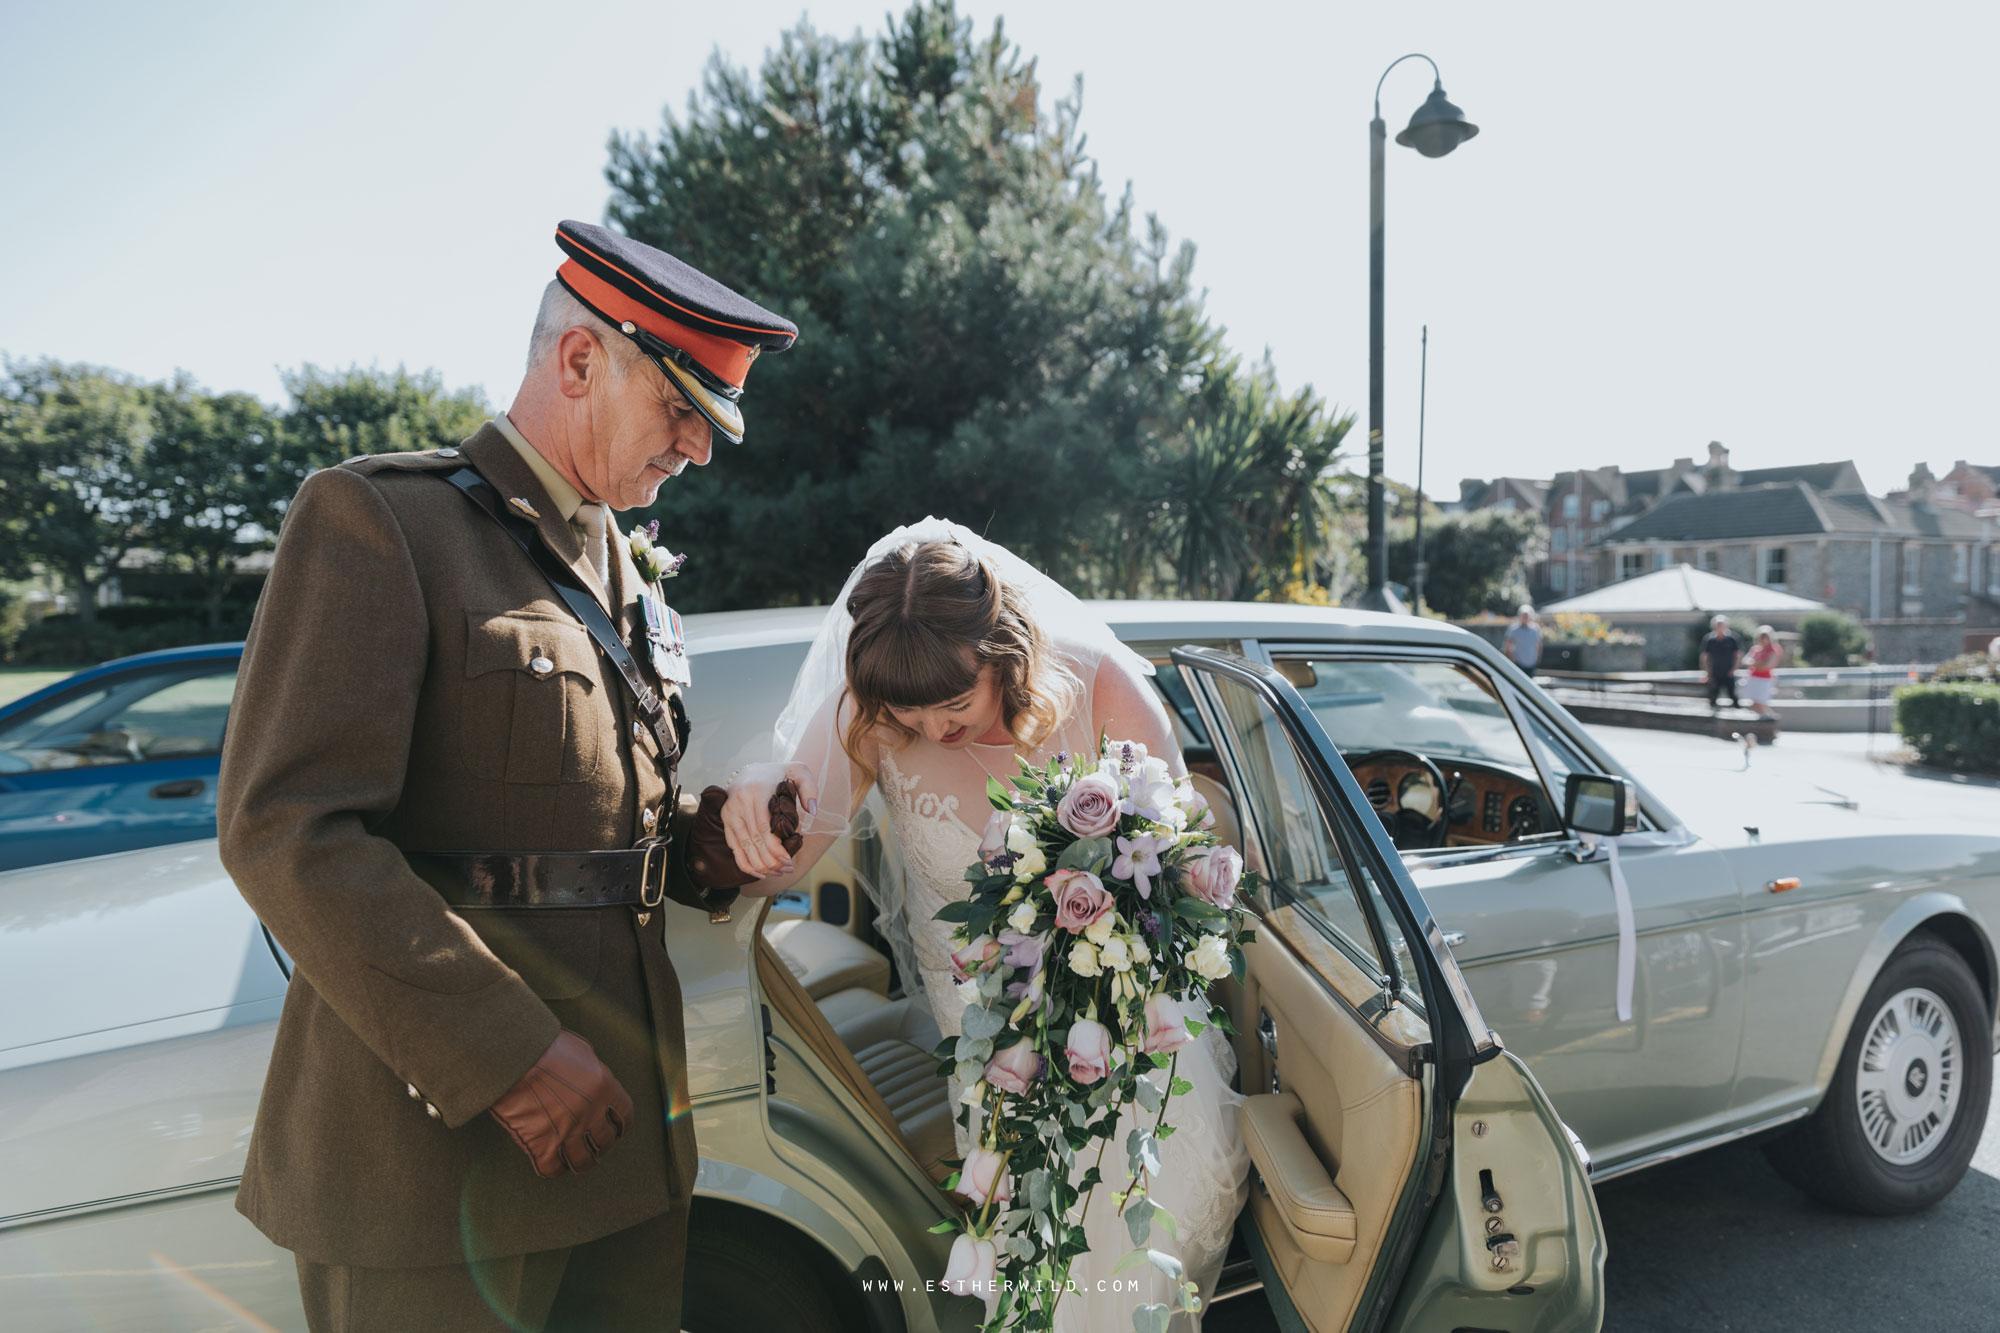 Cromer_Wedding_Beach_Outdoor_Ceremony_Norfolk_North_Lodge_Registry_Office_Rocket_House_Cafe_Cromer_Pier_IMG_3563.jpg